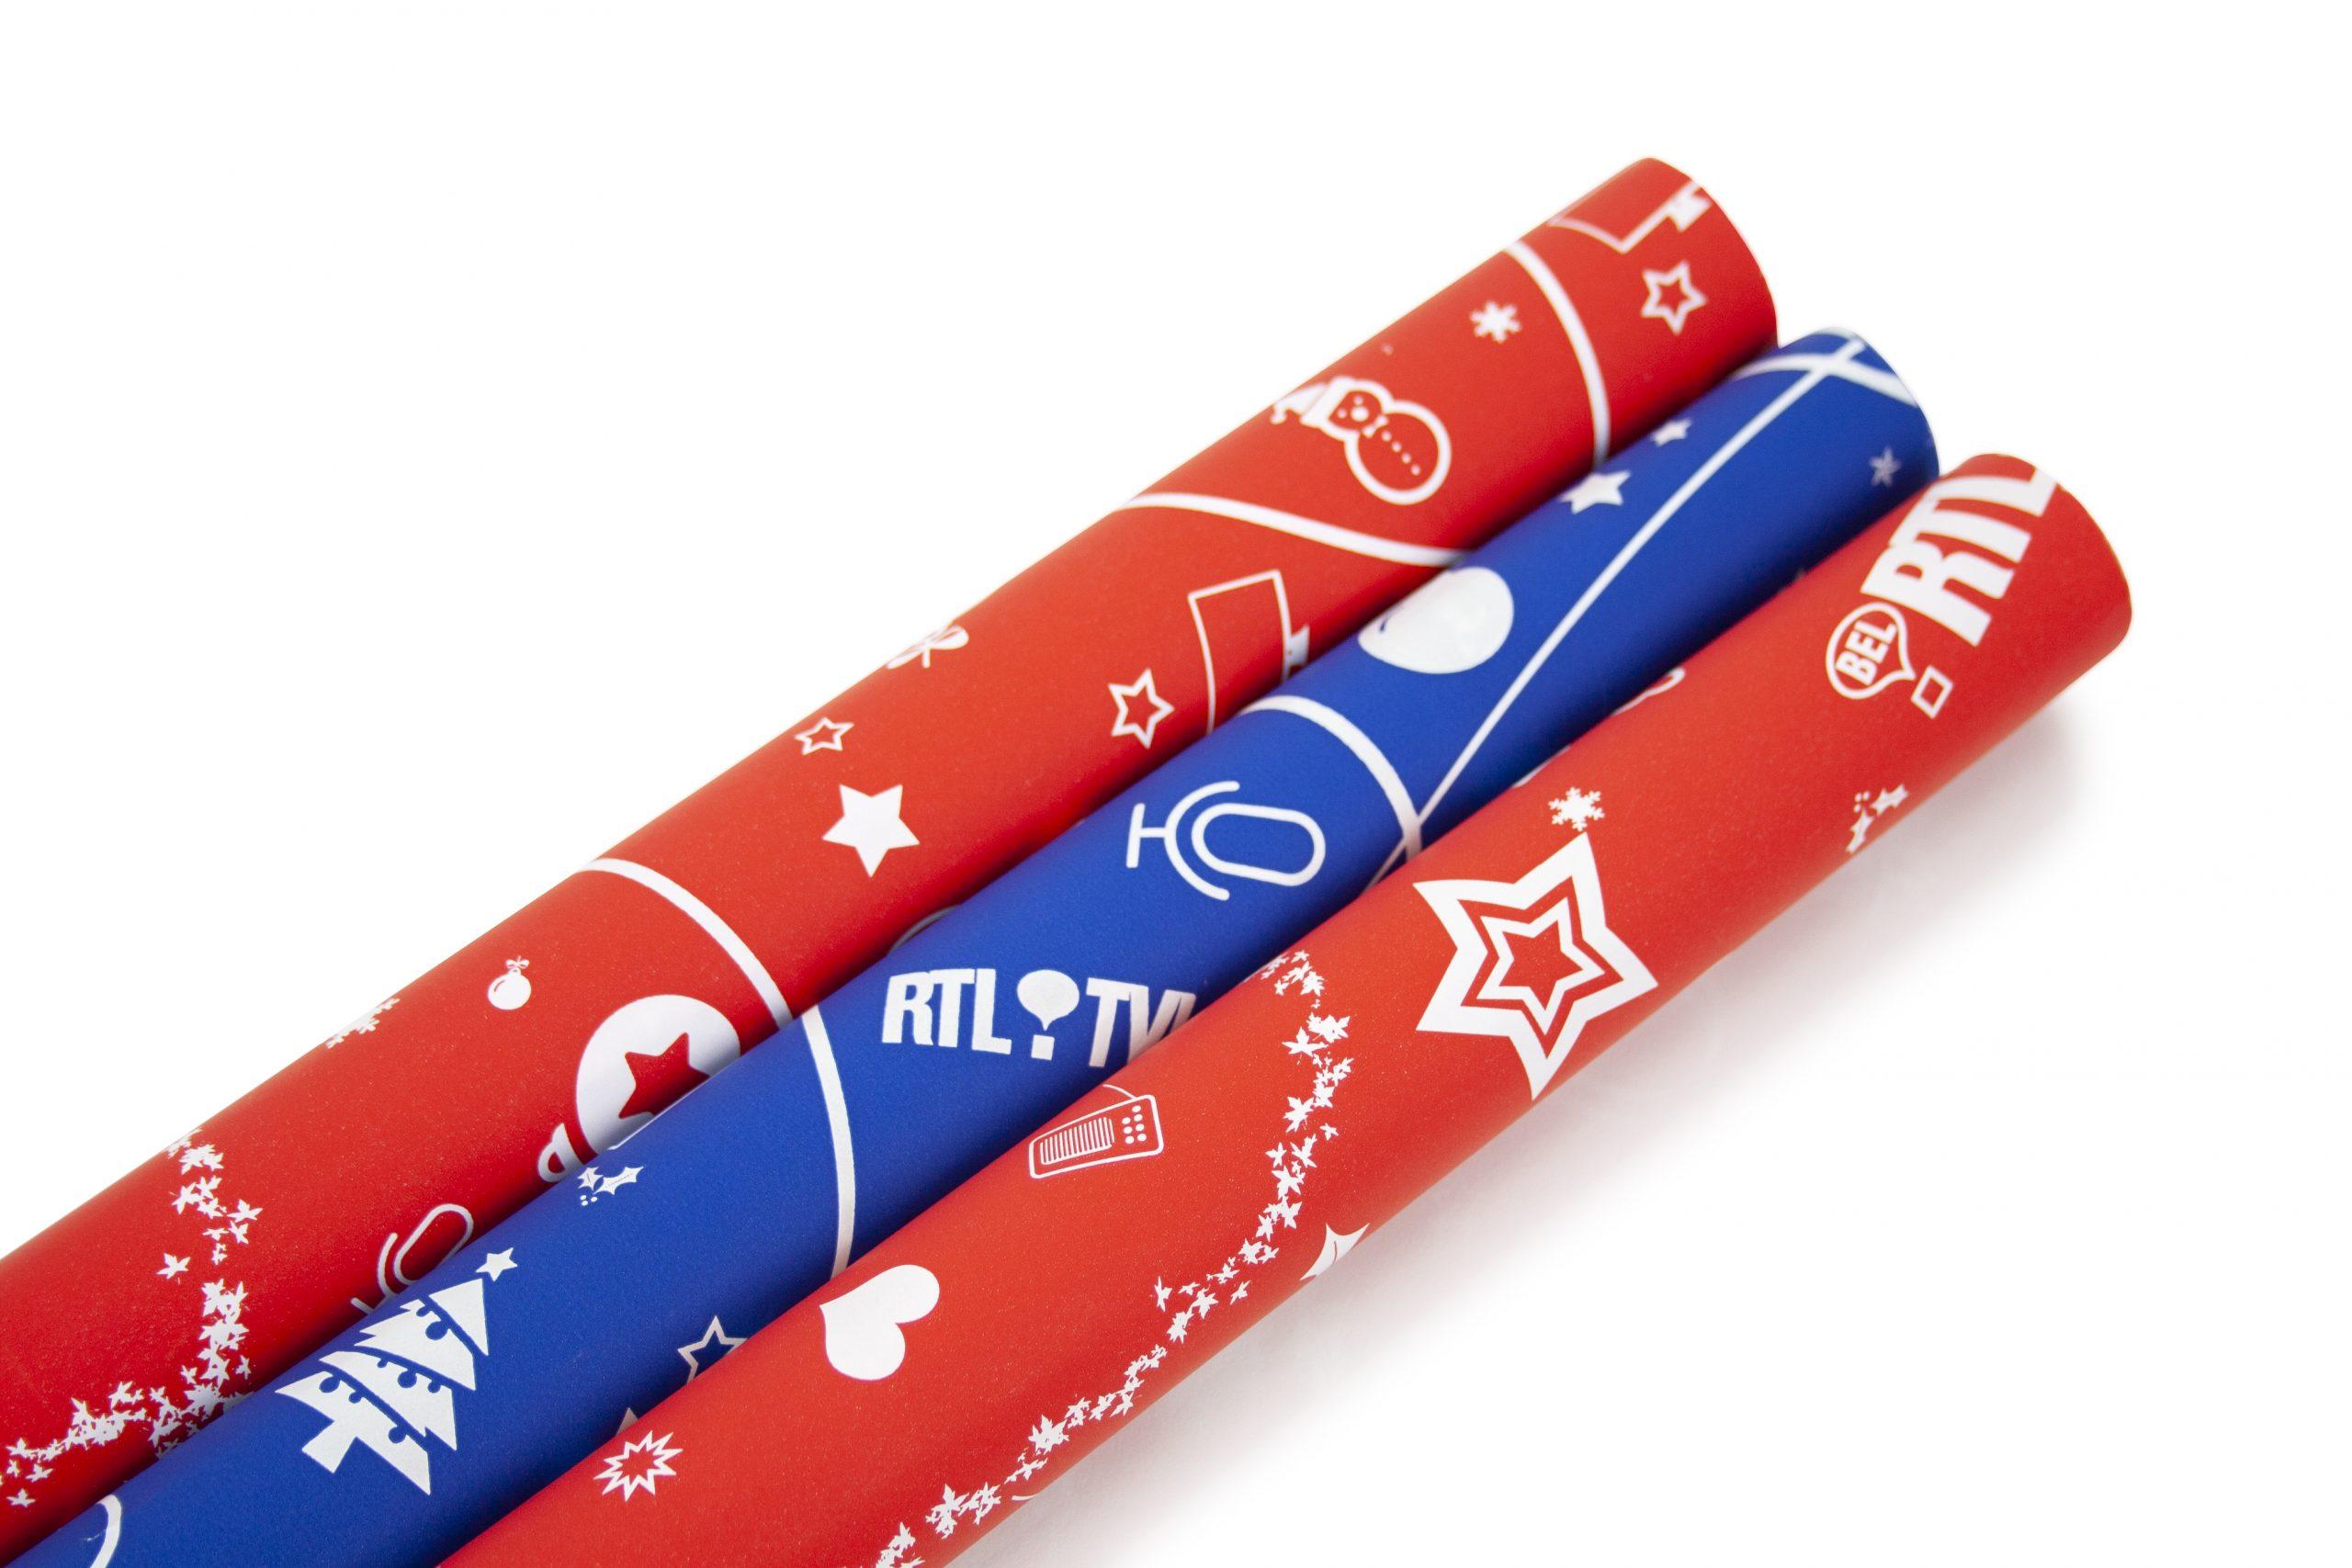 Inpakpapier feestdagen bedrukt met logo